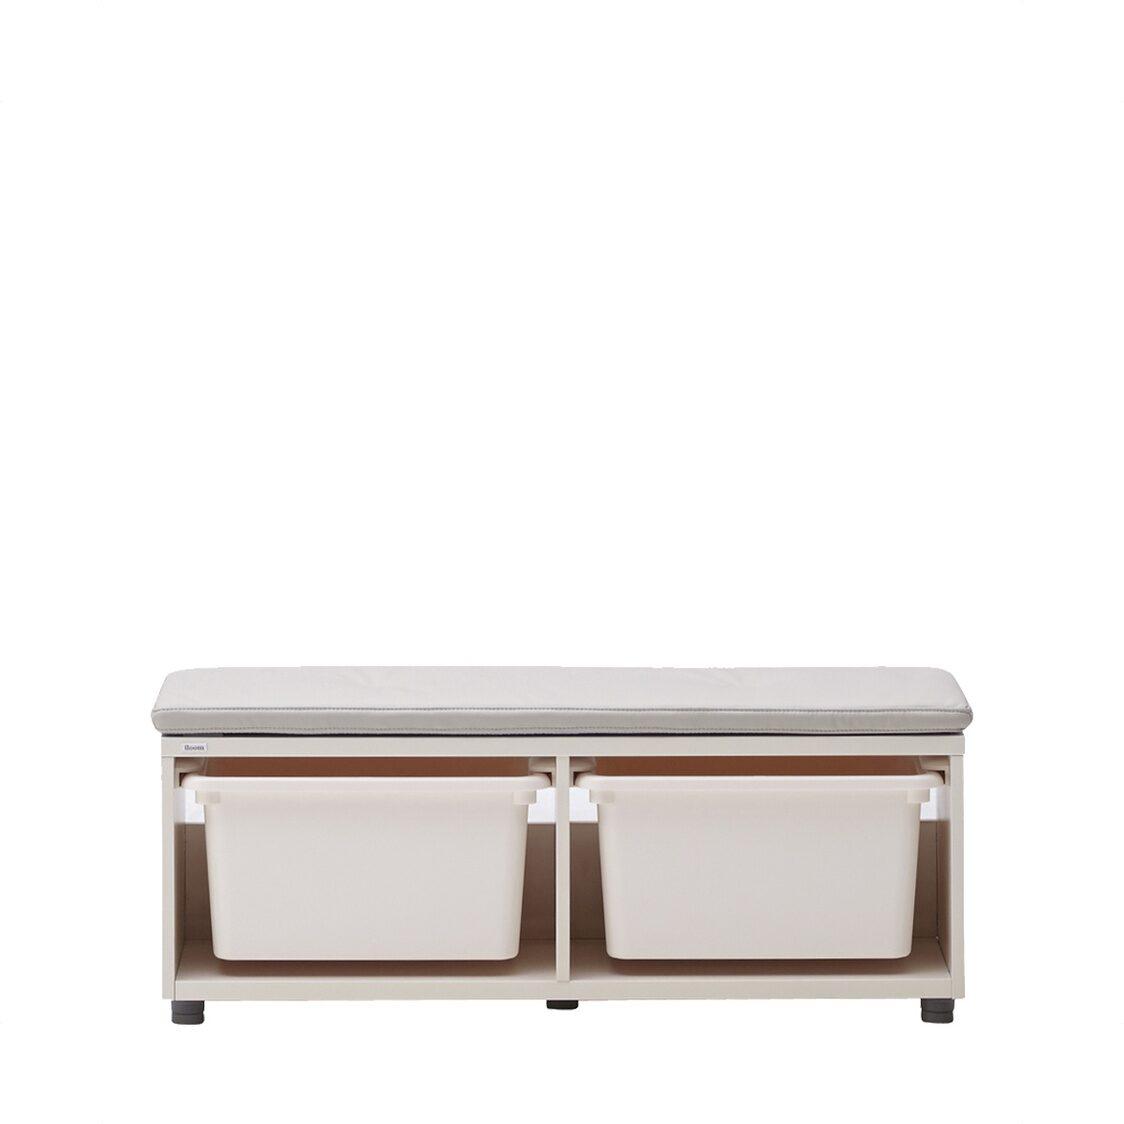 Iloom 950W Bench with storage HSFP191-IVIV